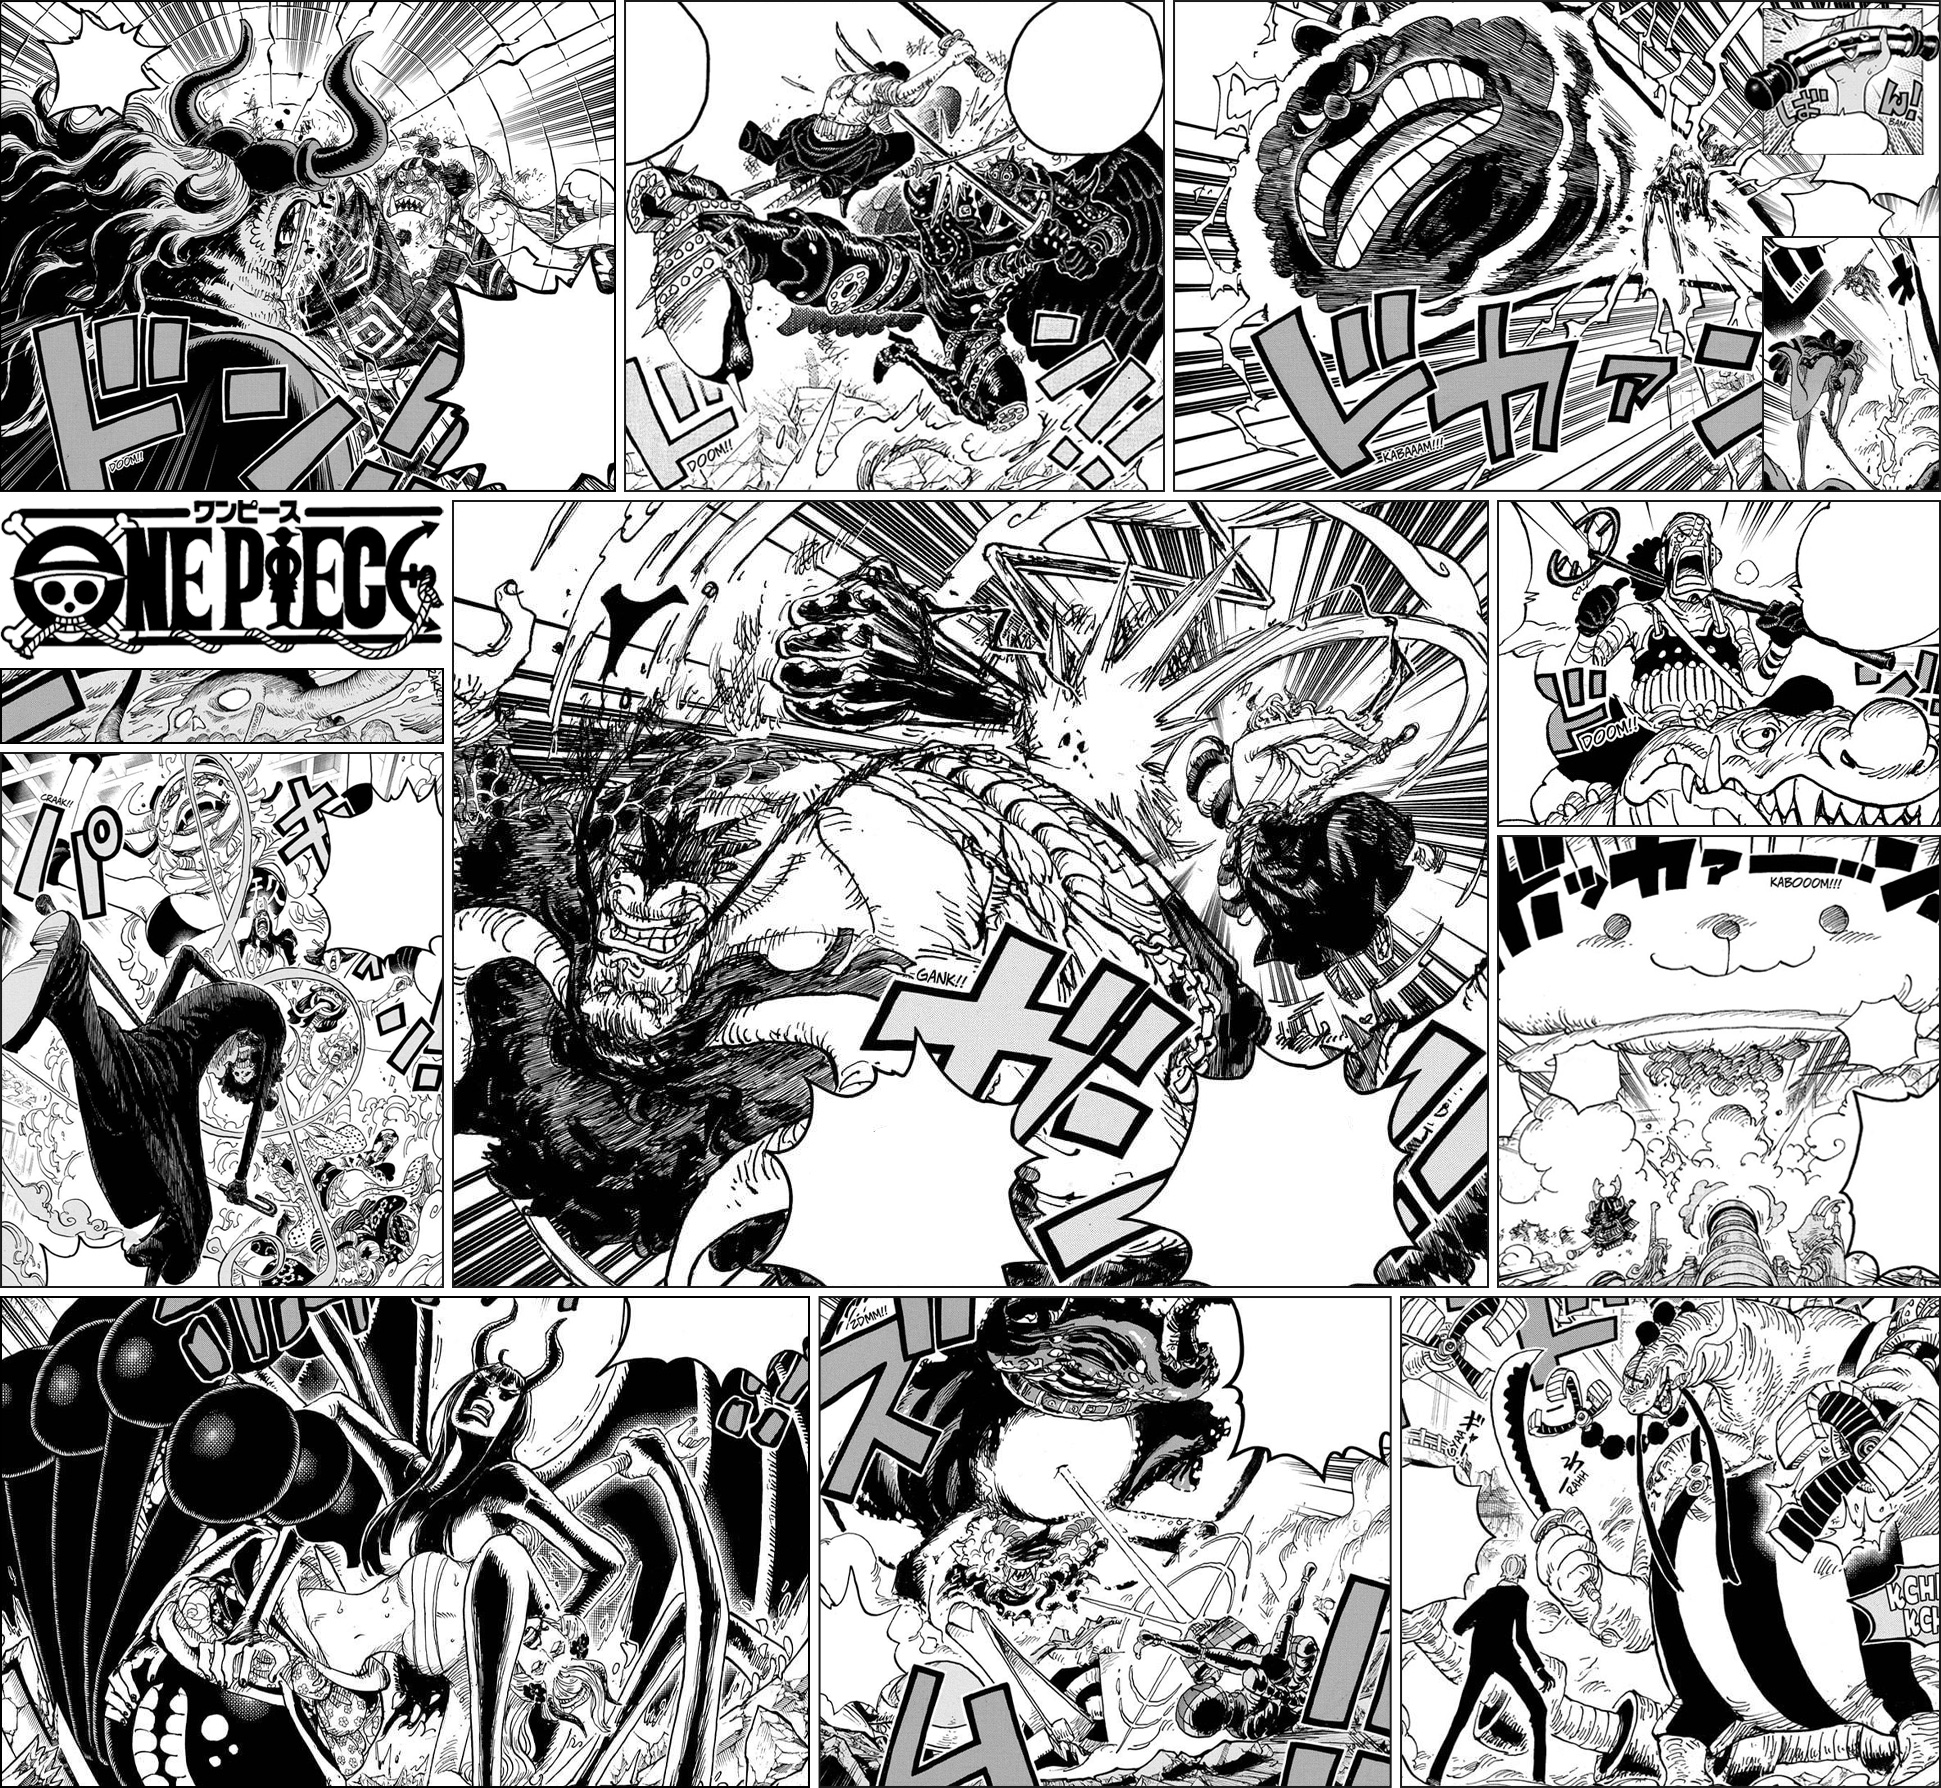 One Piece Onigashima - Straw Hat Pirates VS Beast Pirates